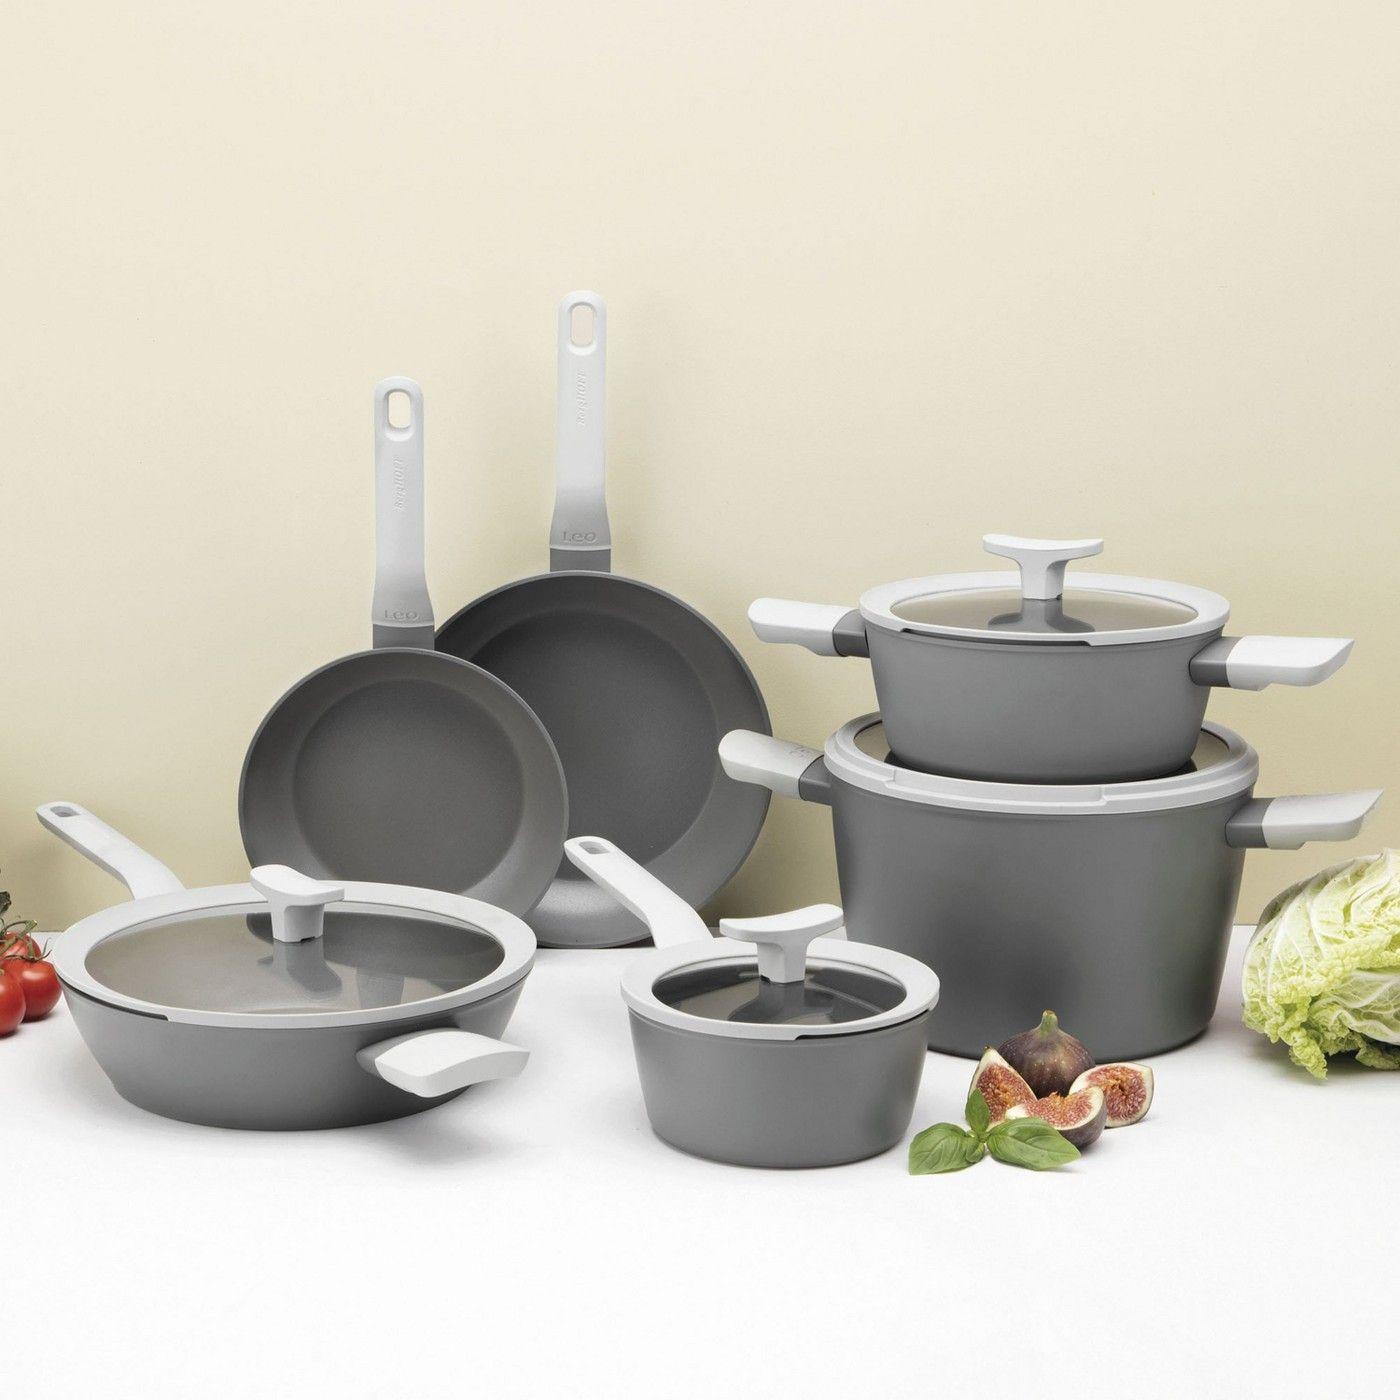 Berghoff Leo Deluxe 10pc Non Stick Cookware Set Gray Cookware Set Black Kitchen Decor Berghoff